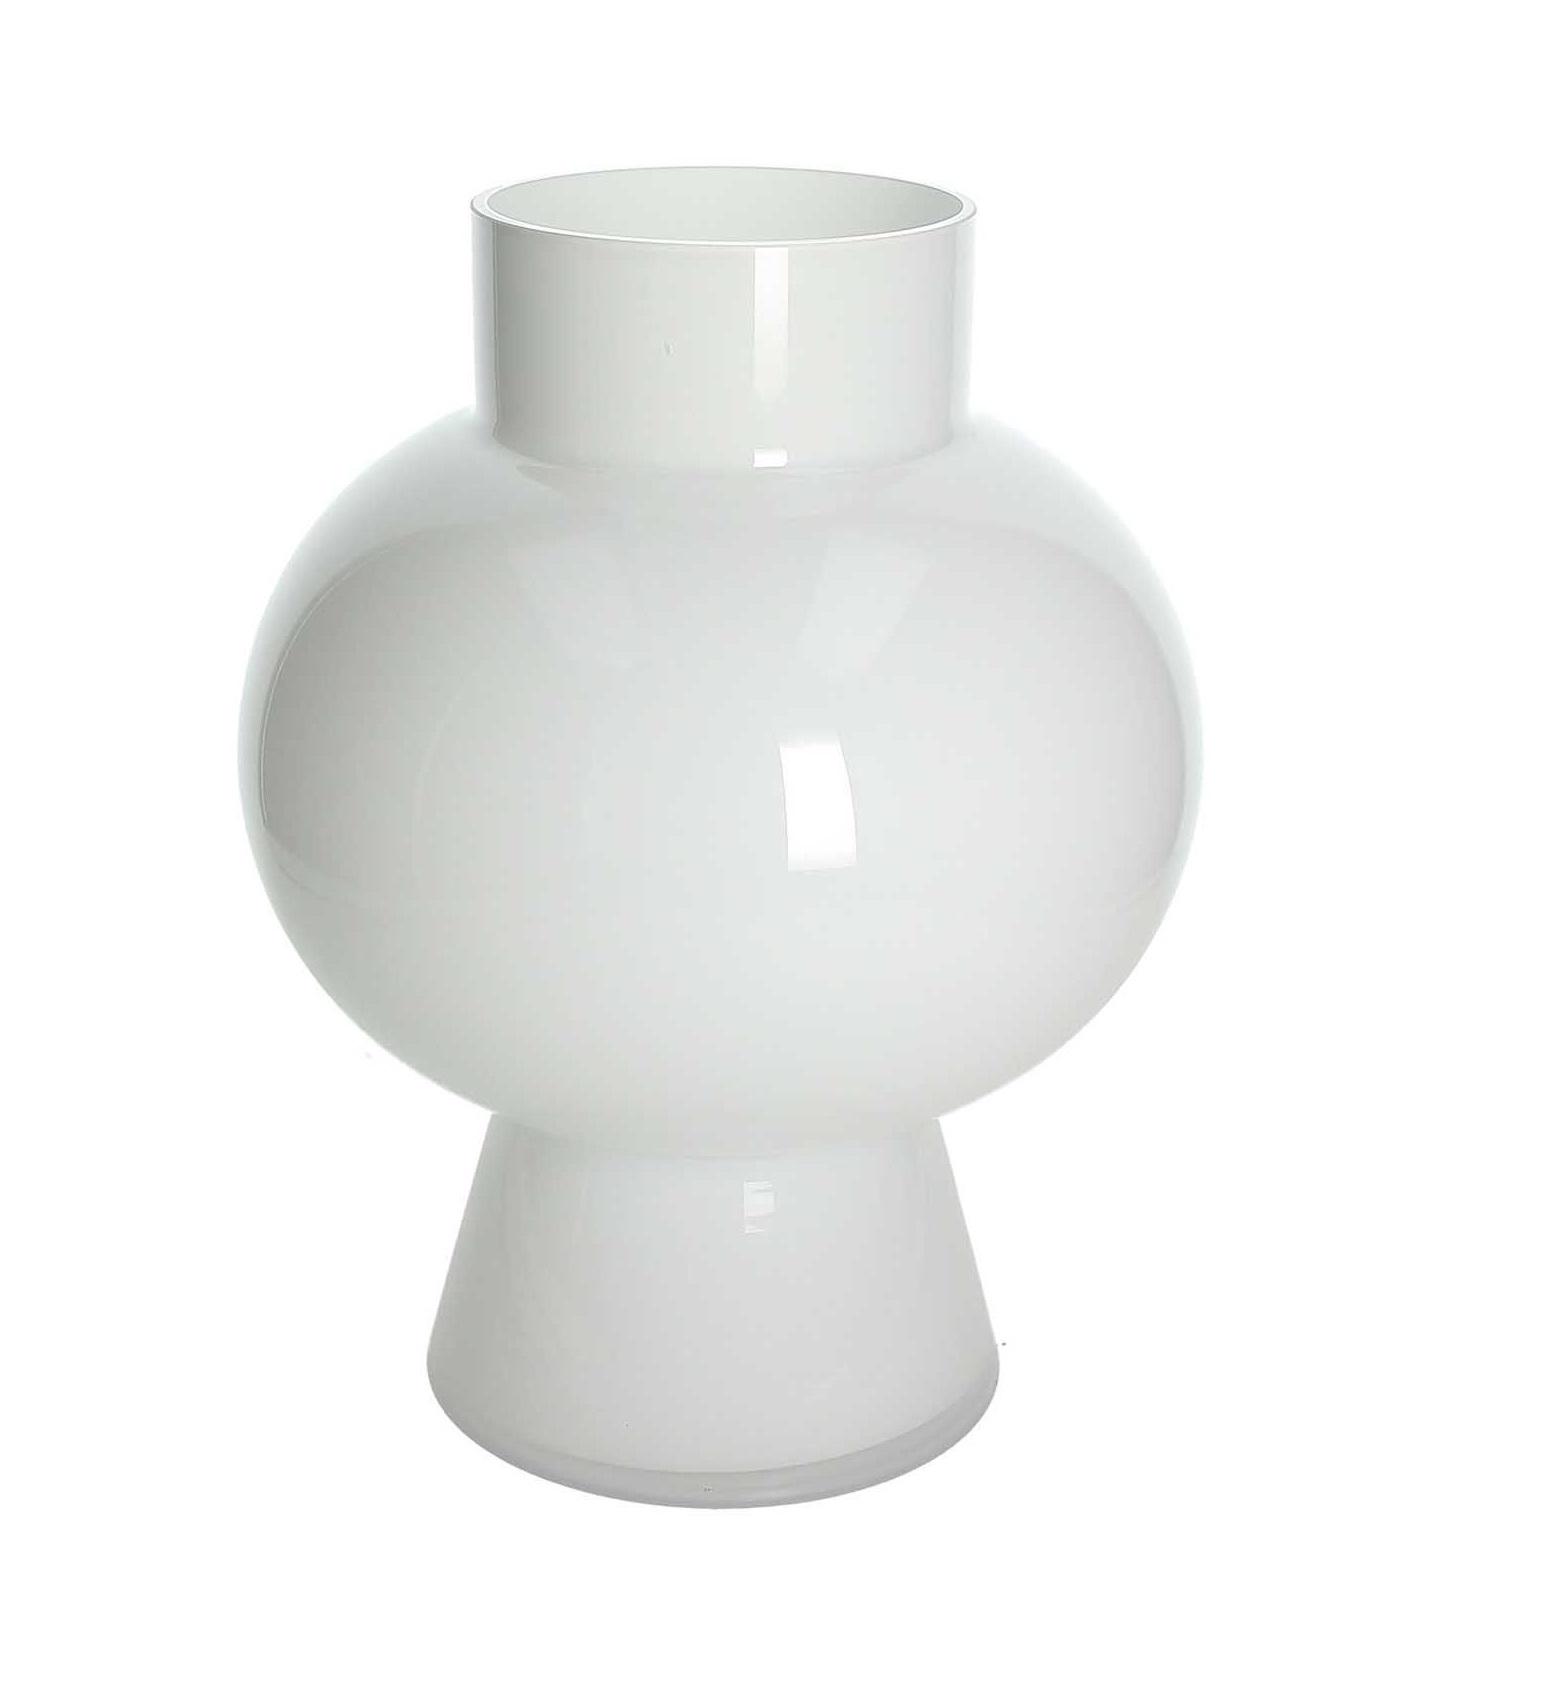 TOGNANA - Vaso Bianco Cm 46h, Kali